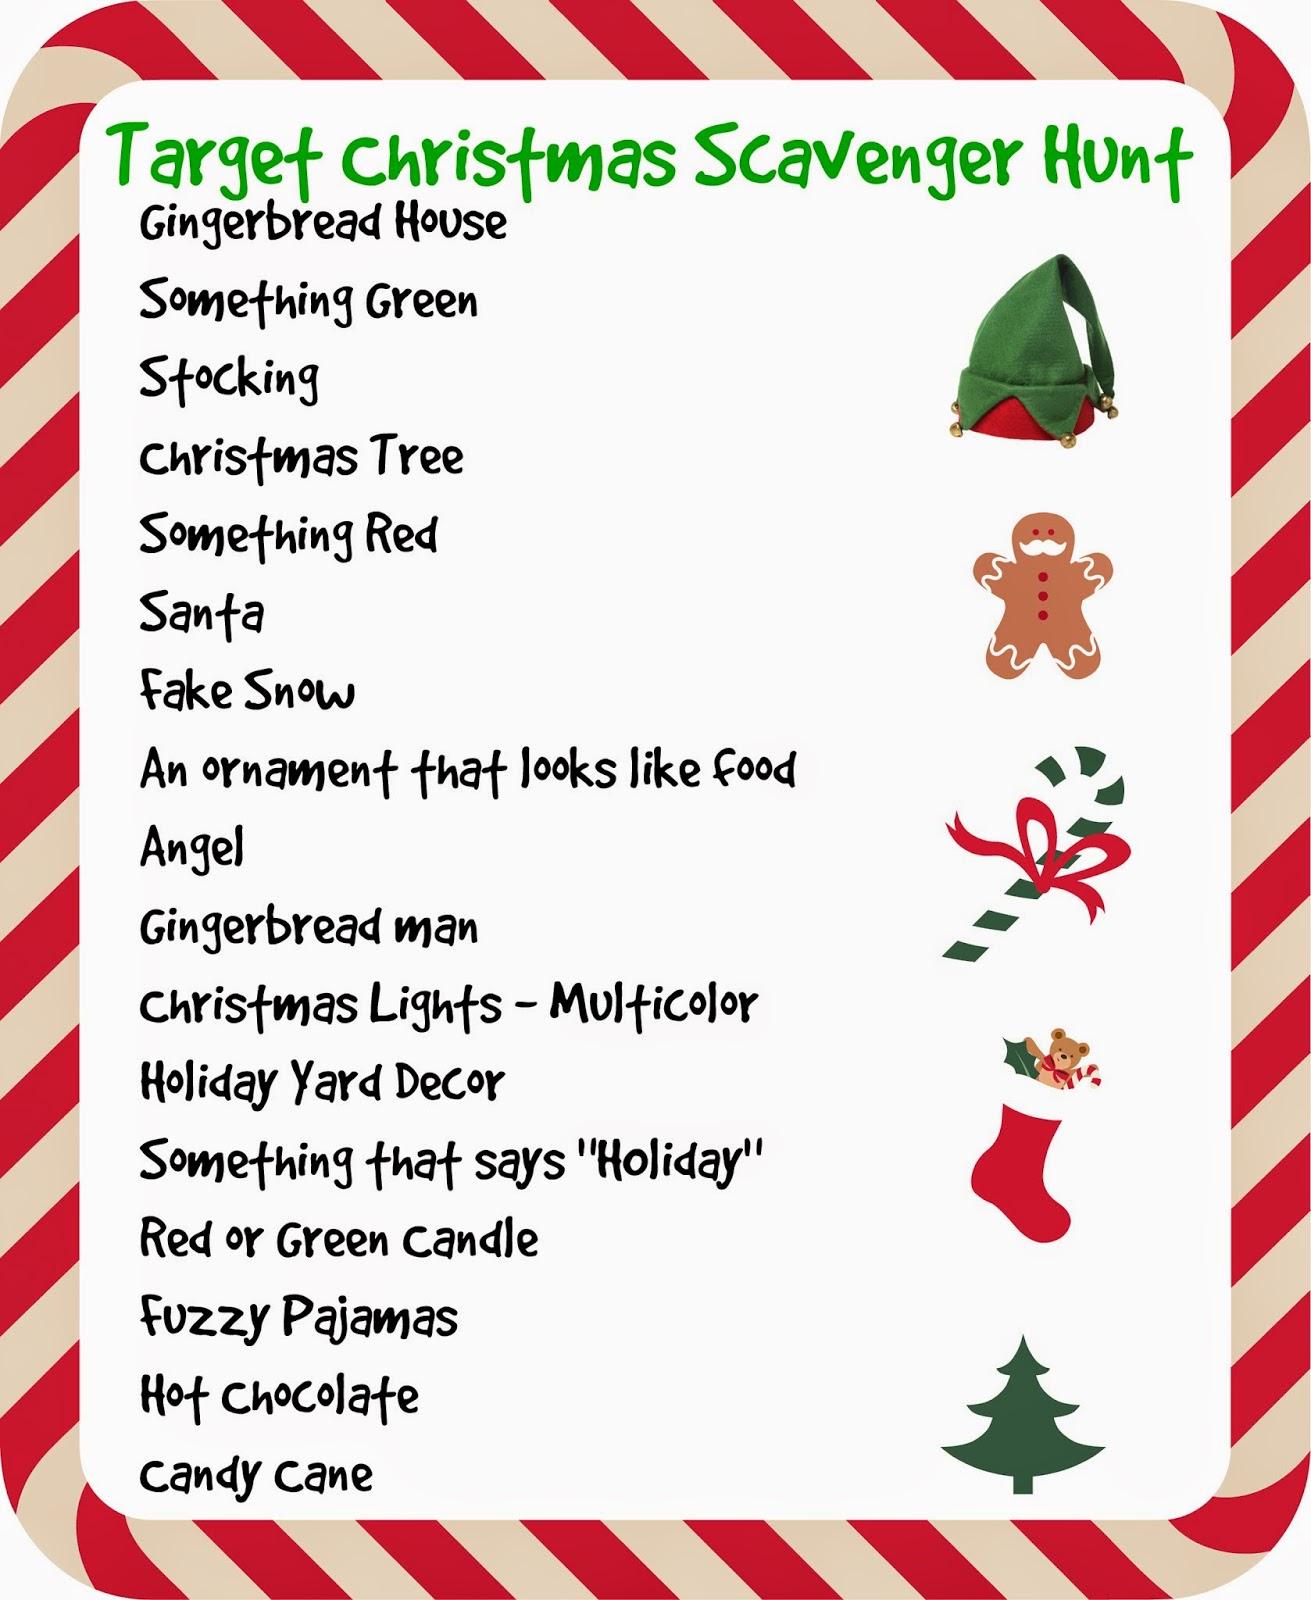 Christmas Scavenger Hunt.Sweetology Target Store Christmas Scavenger Hunt